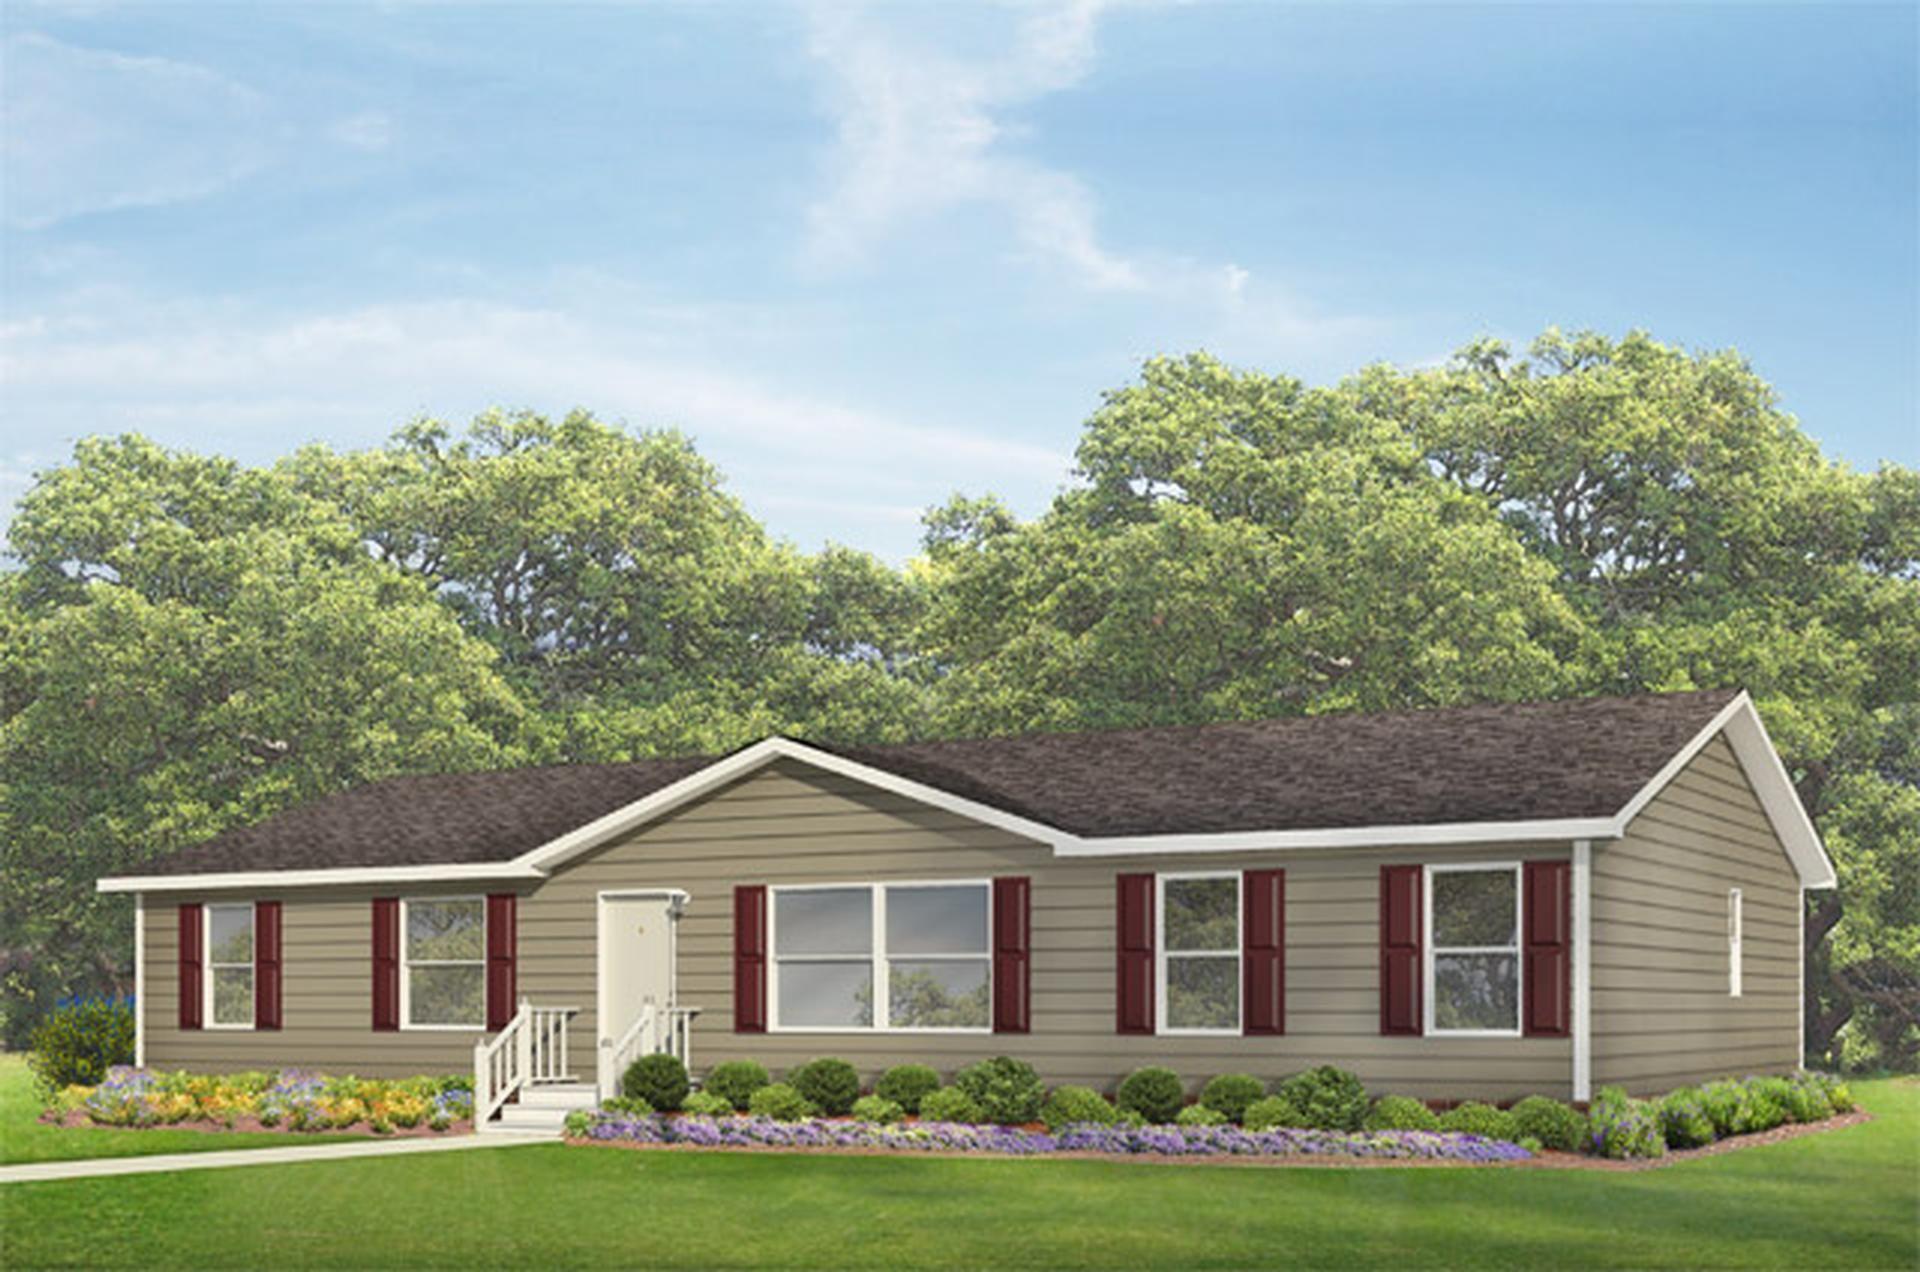 Pin by Carolyn Dunn on House Plans Modular homes